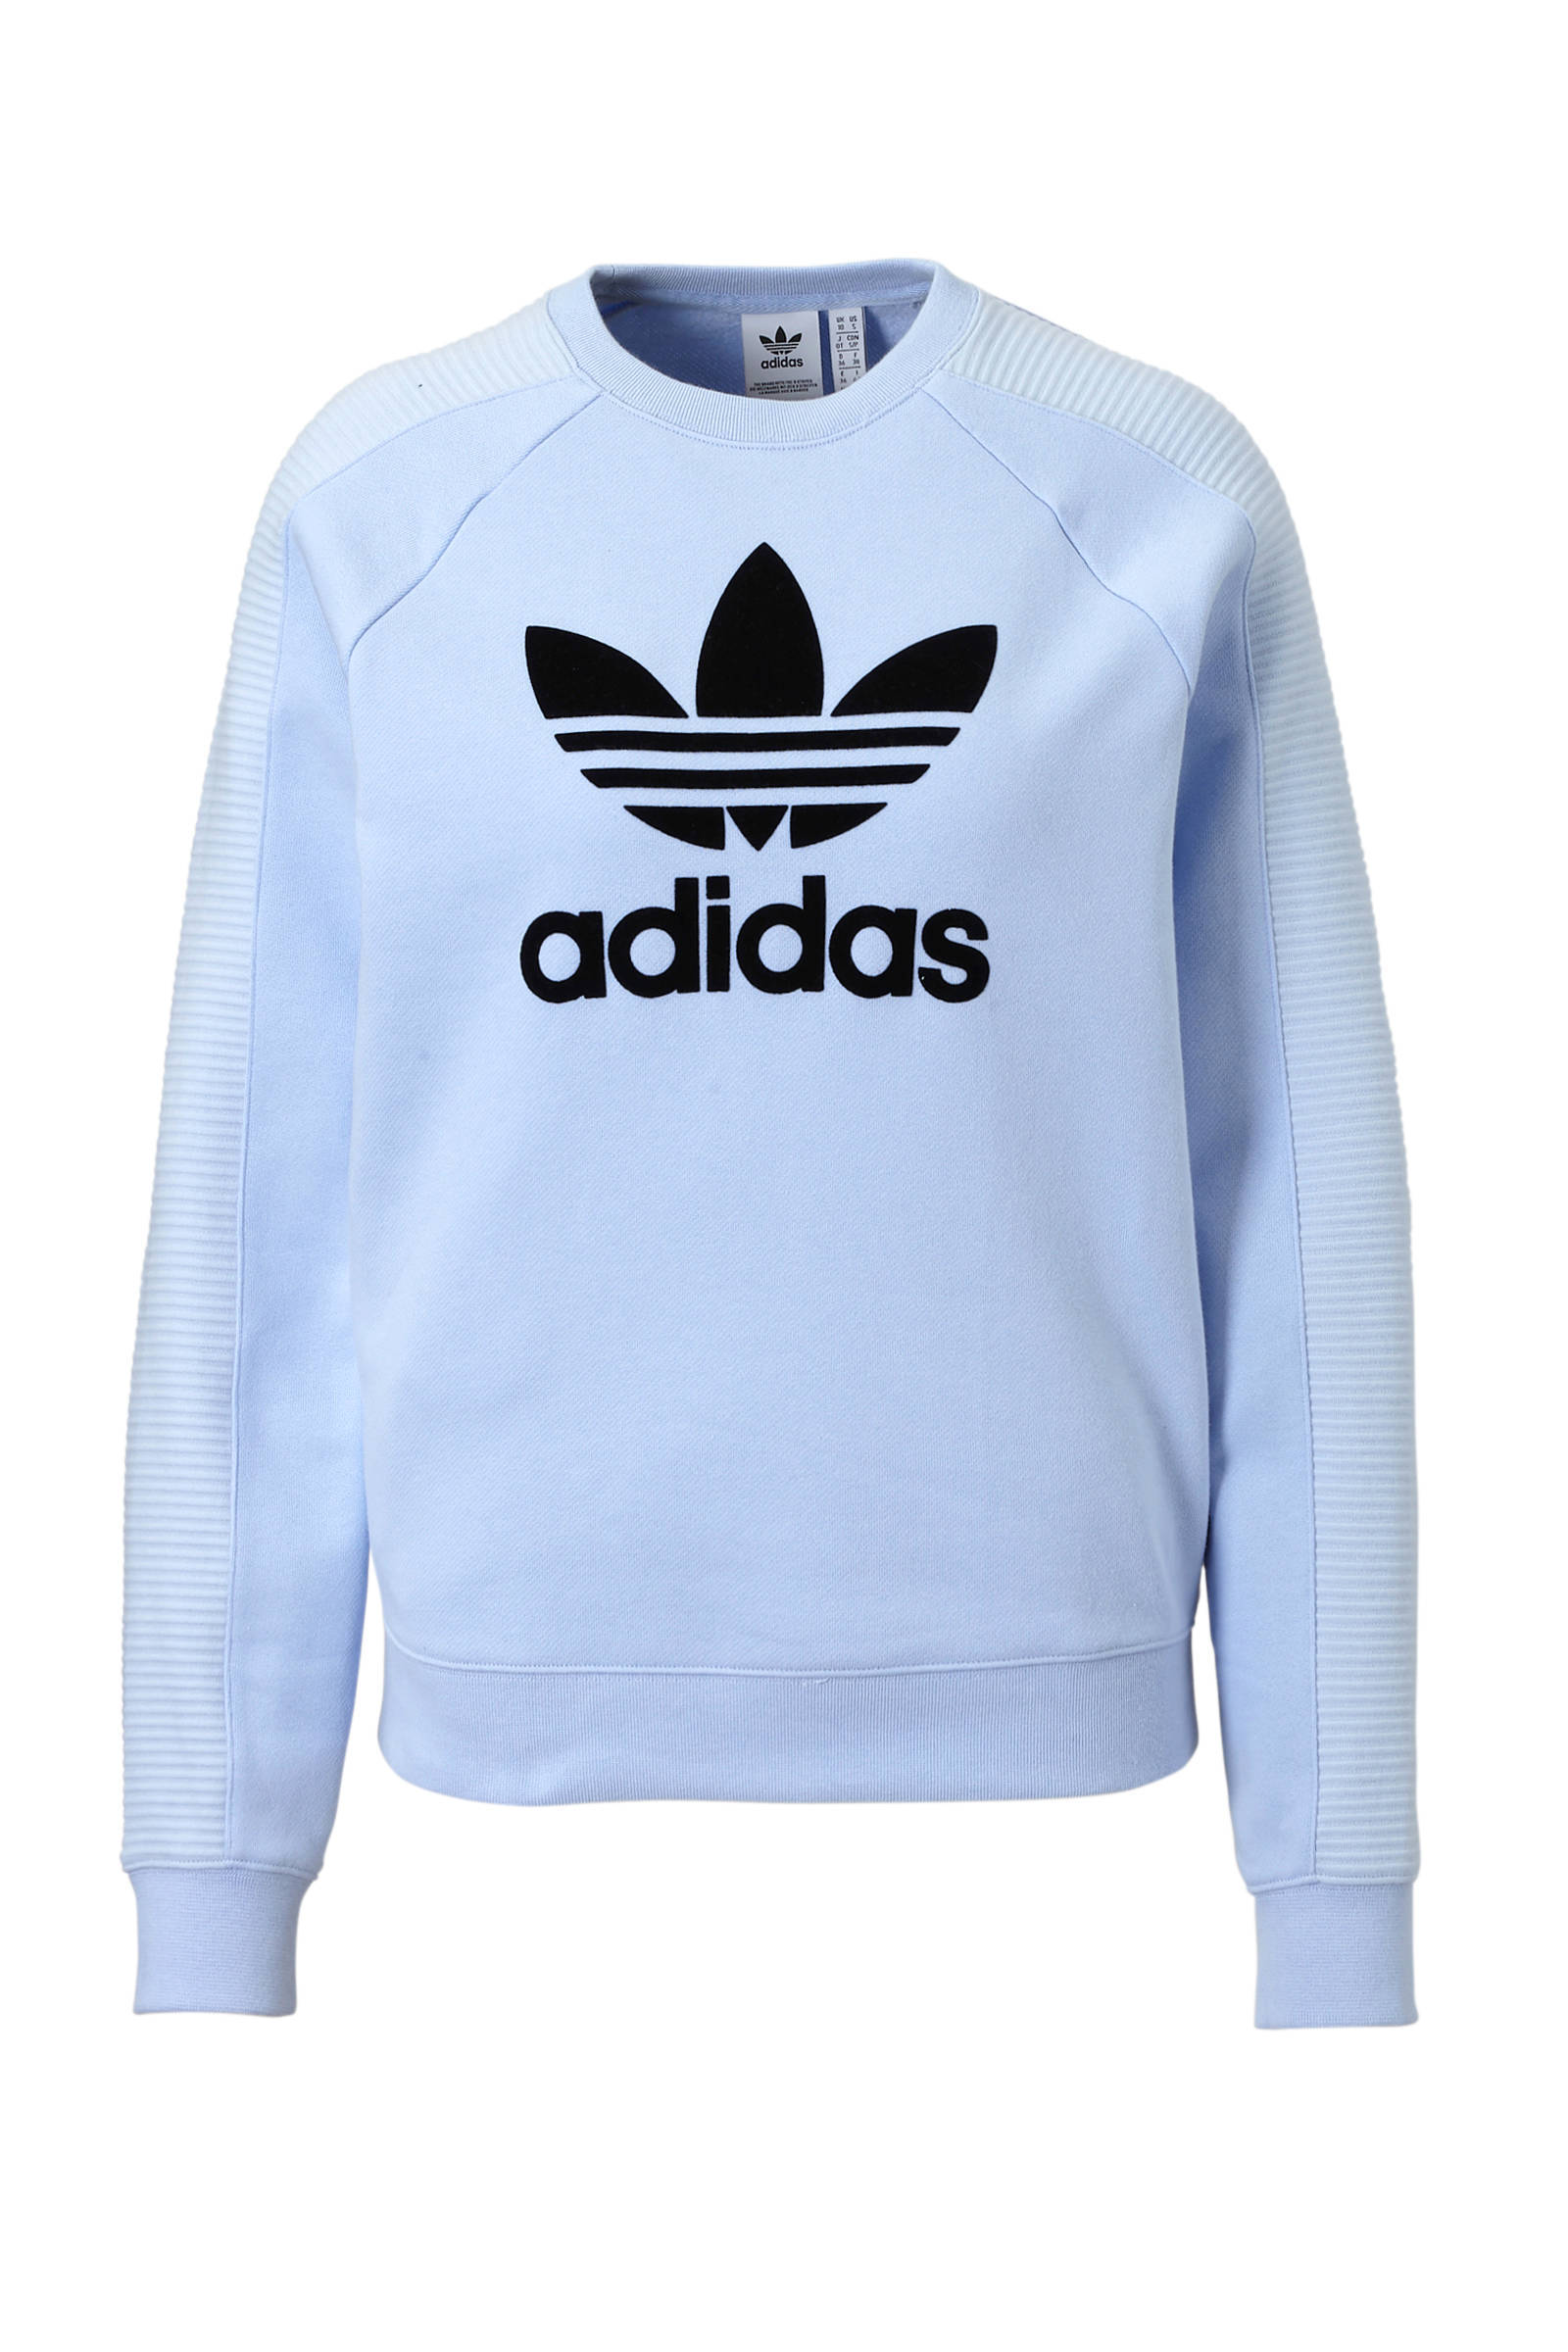 adidas Originals sweater lila | wehkamp